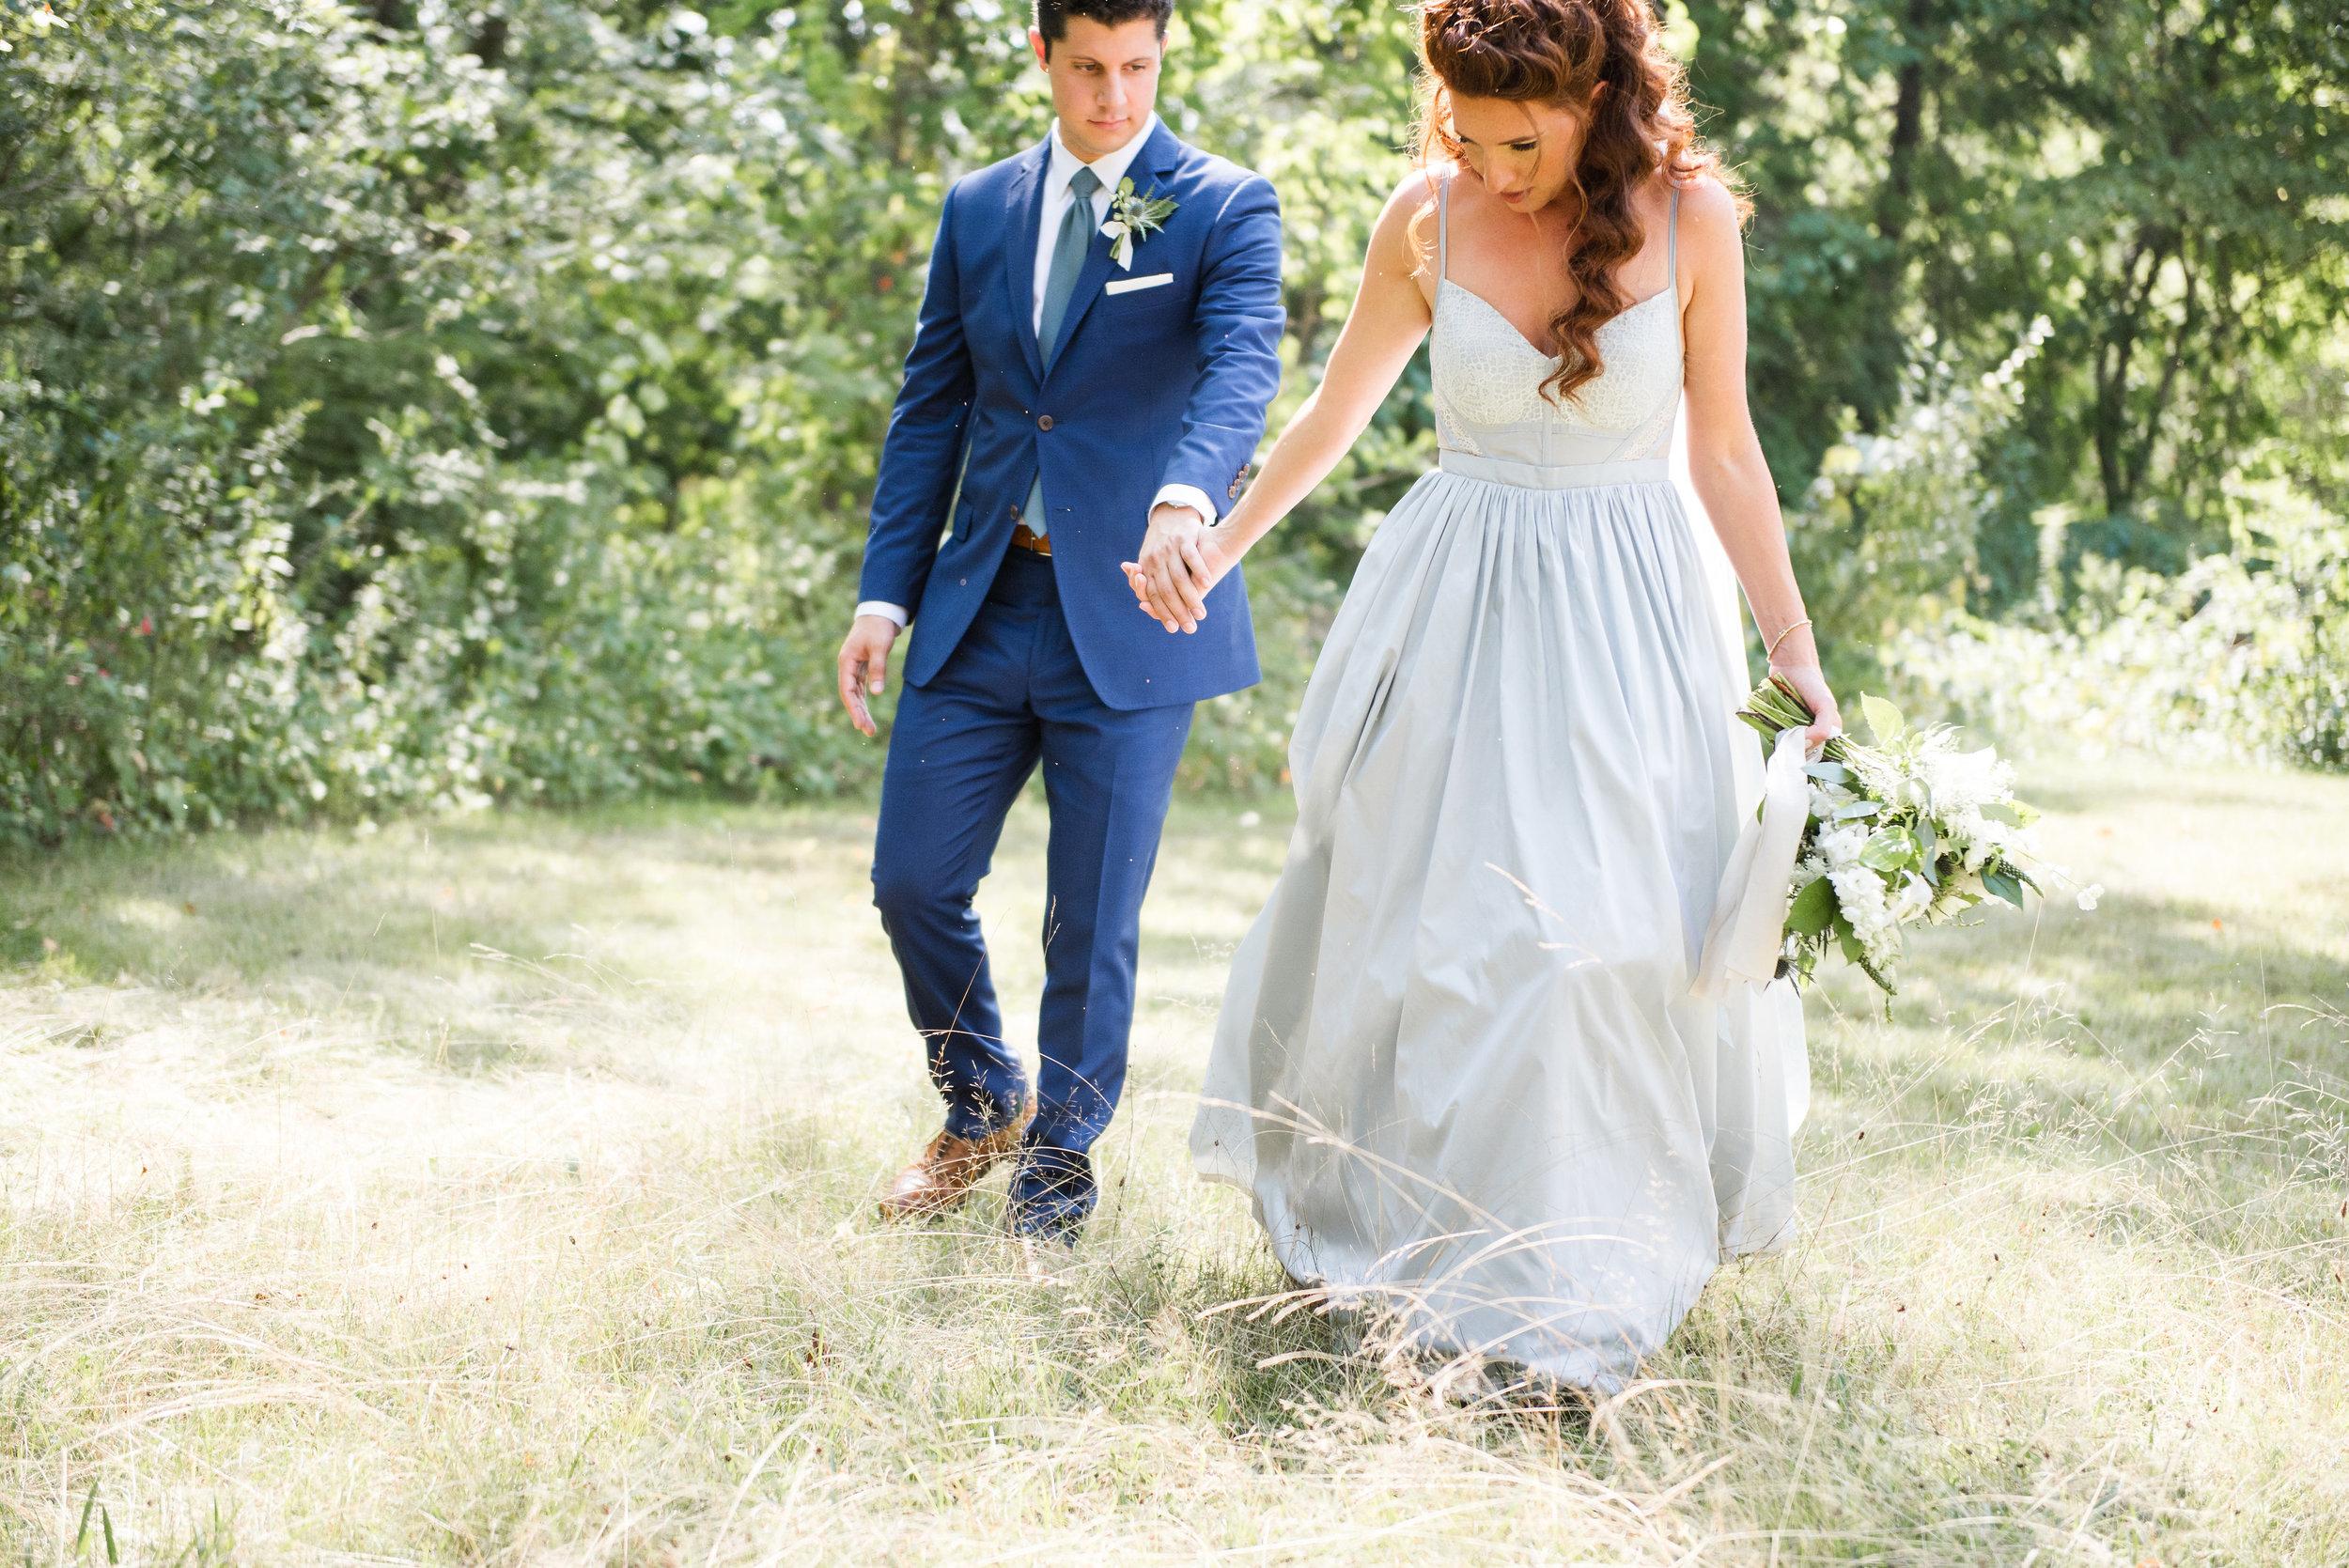 COPPER GEOMETRIC WEDDING LACE FACTORY WEDDING_036.jpg